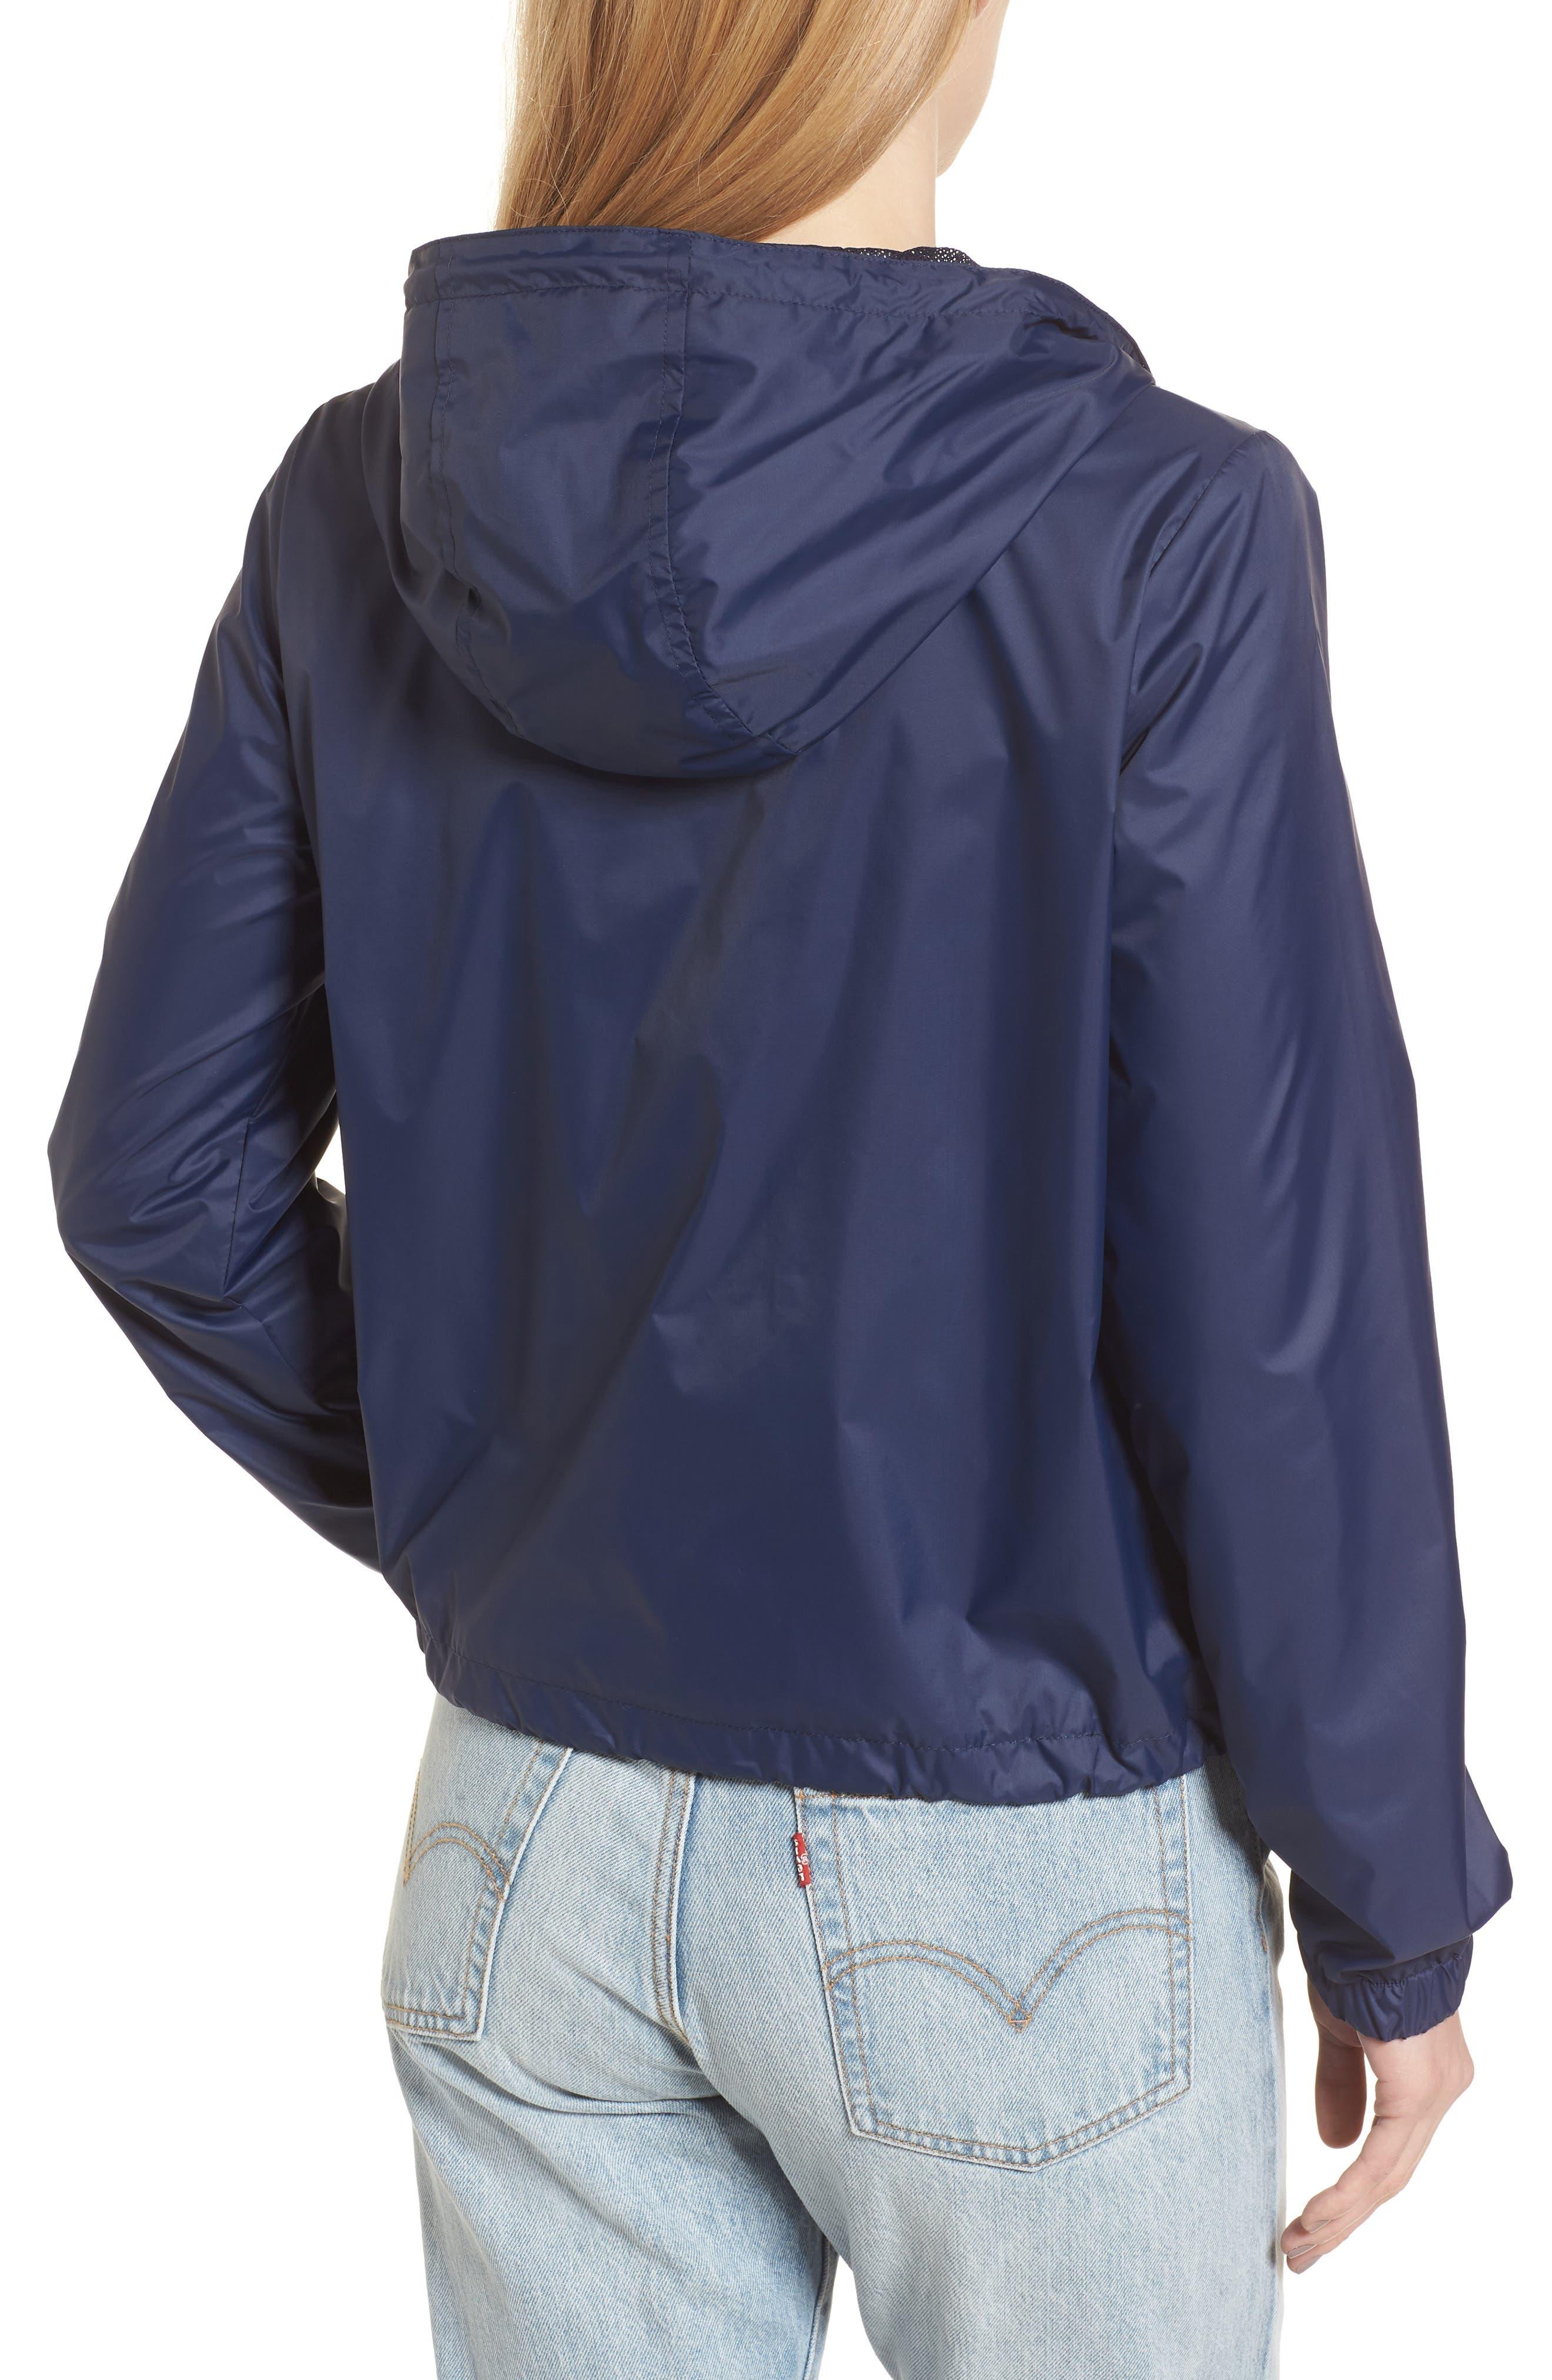 Retro Hooded Coach's Jacket,                             Alternate thumbnail 2, color,                             Navy